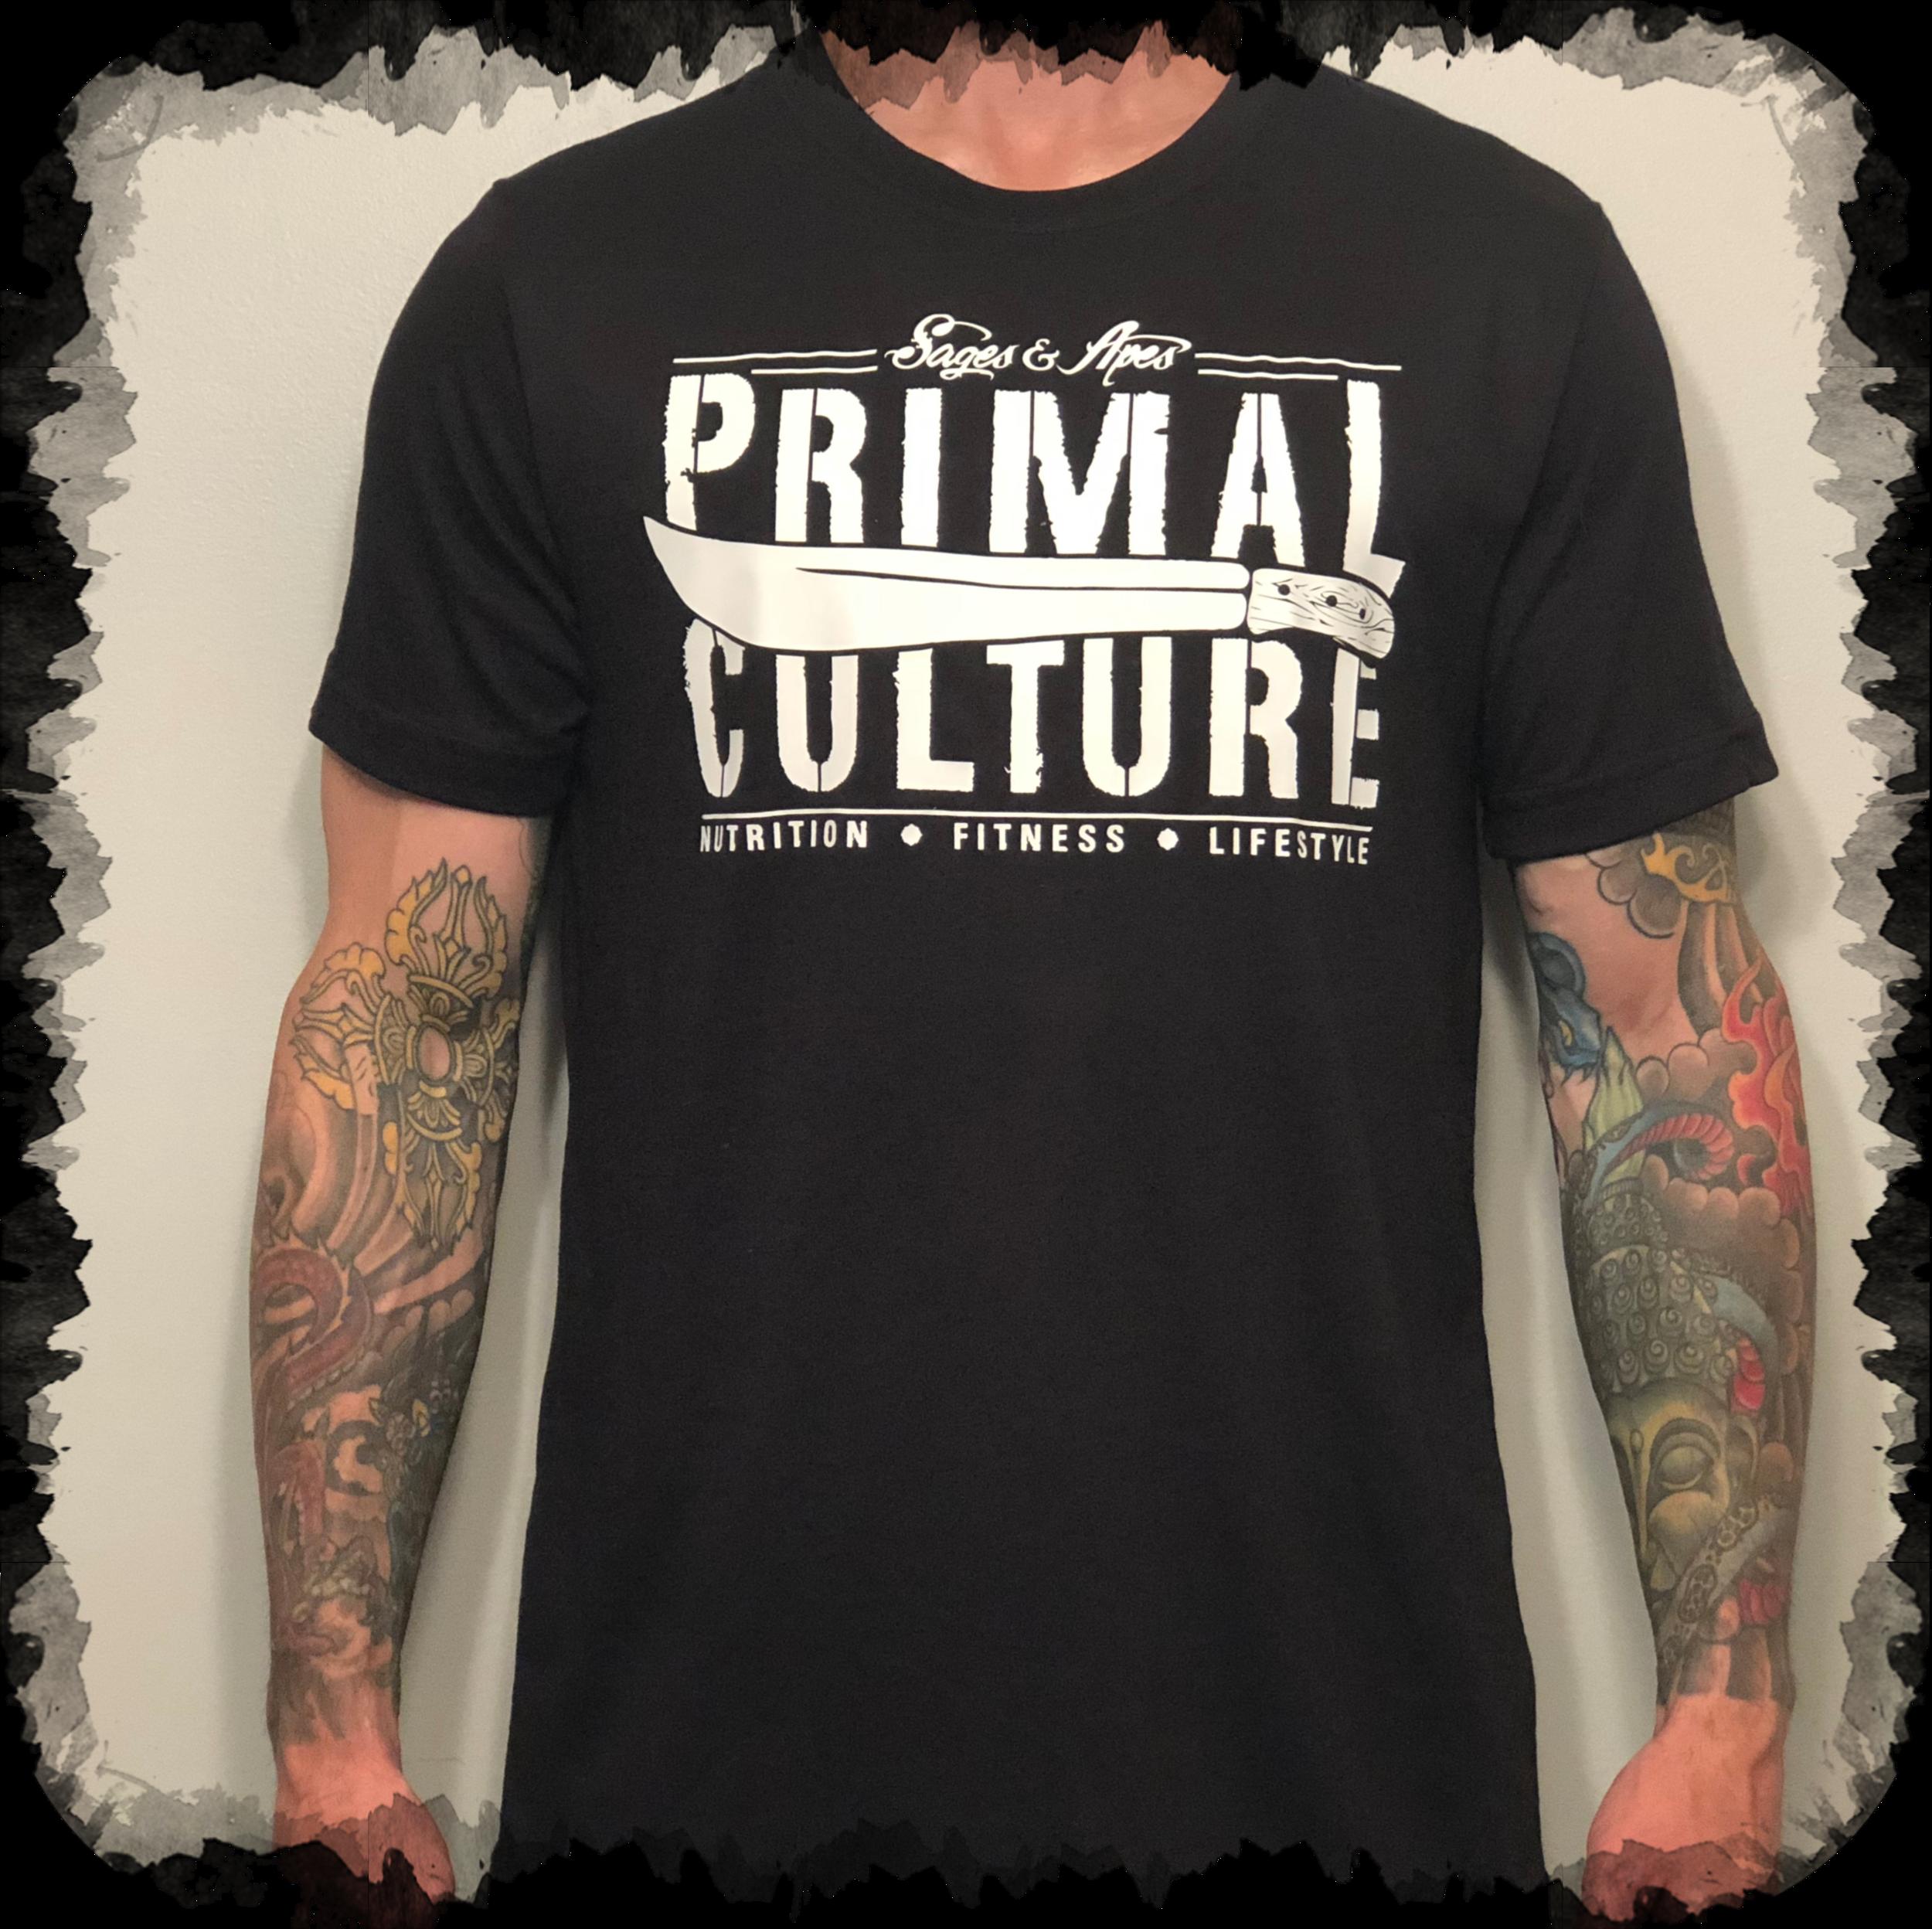 Primal Culture w/ Machete